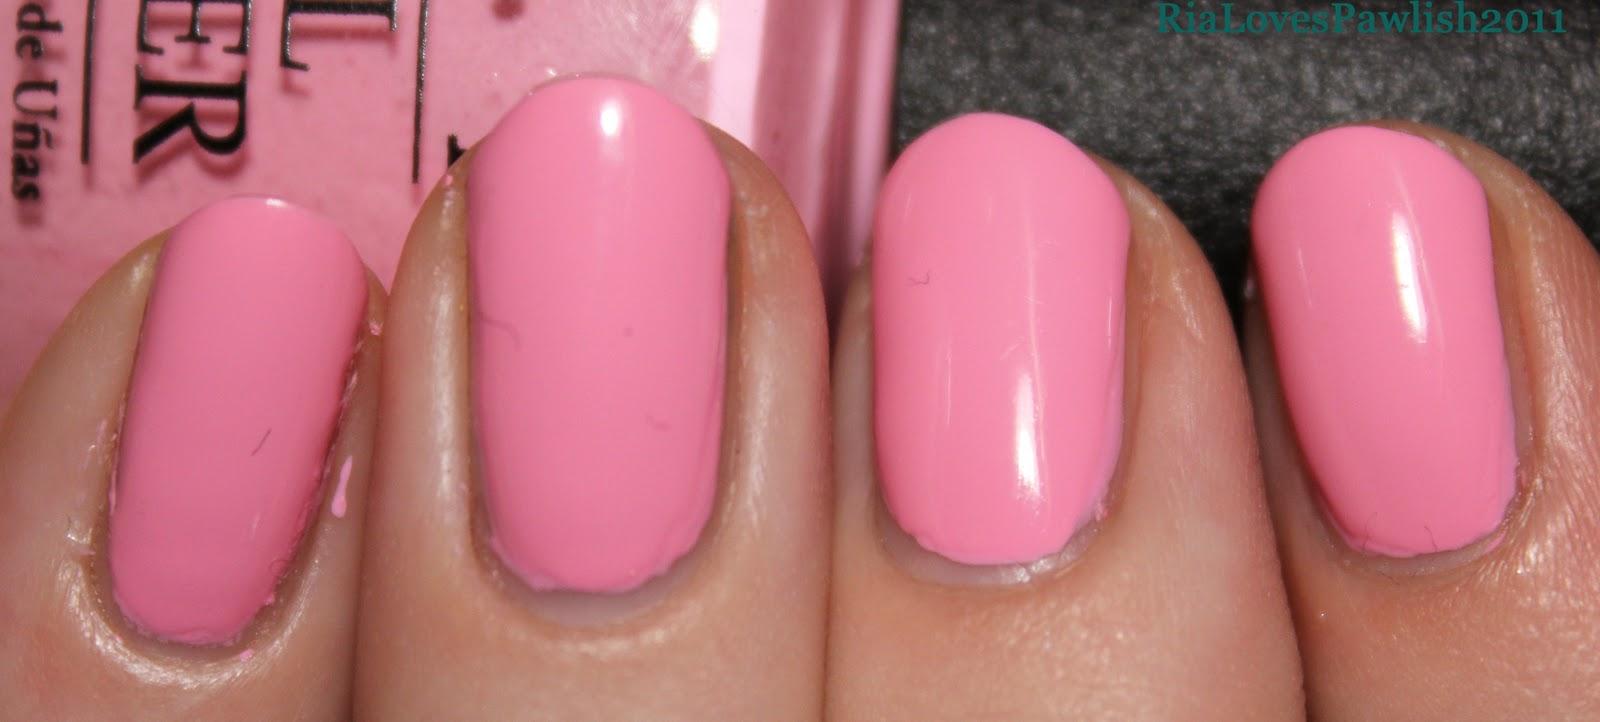 Ria Loves Pawlish: OPI Nicki Minaj Pink Friday under OPI Super Bass ...